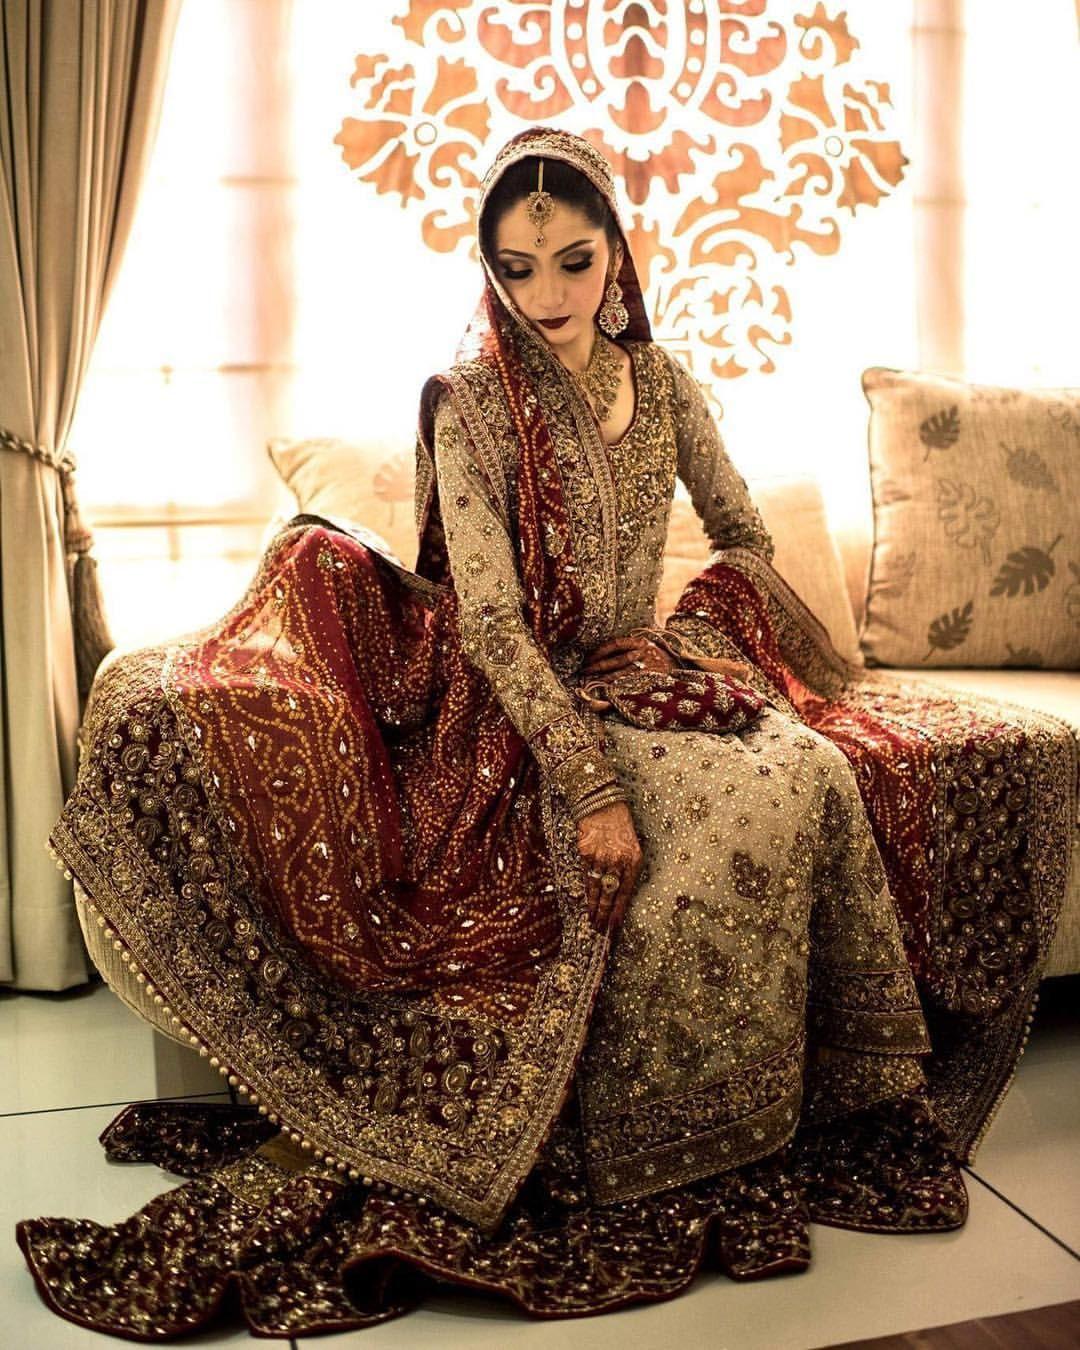 55e0726b0 Pin by nooha on Pakistani wedding dresses in 2019